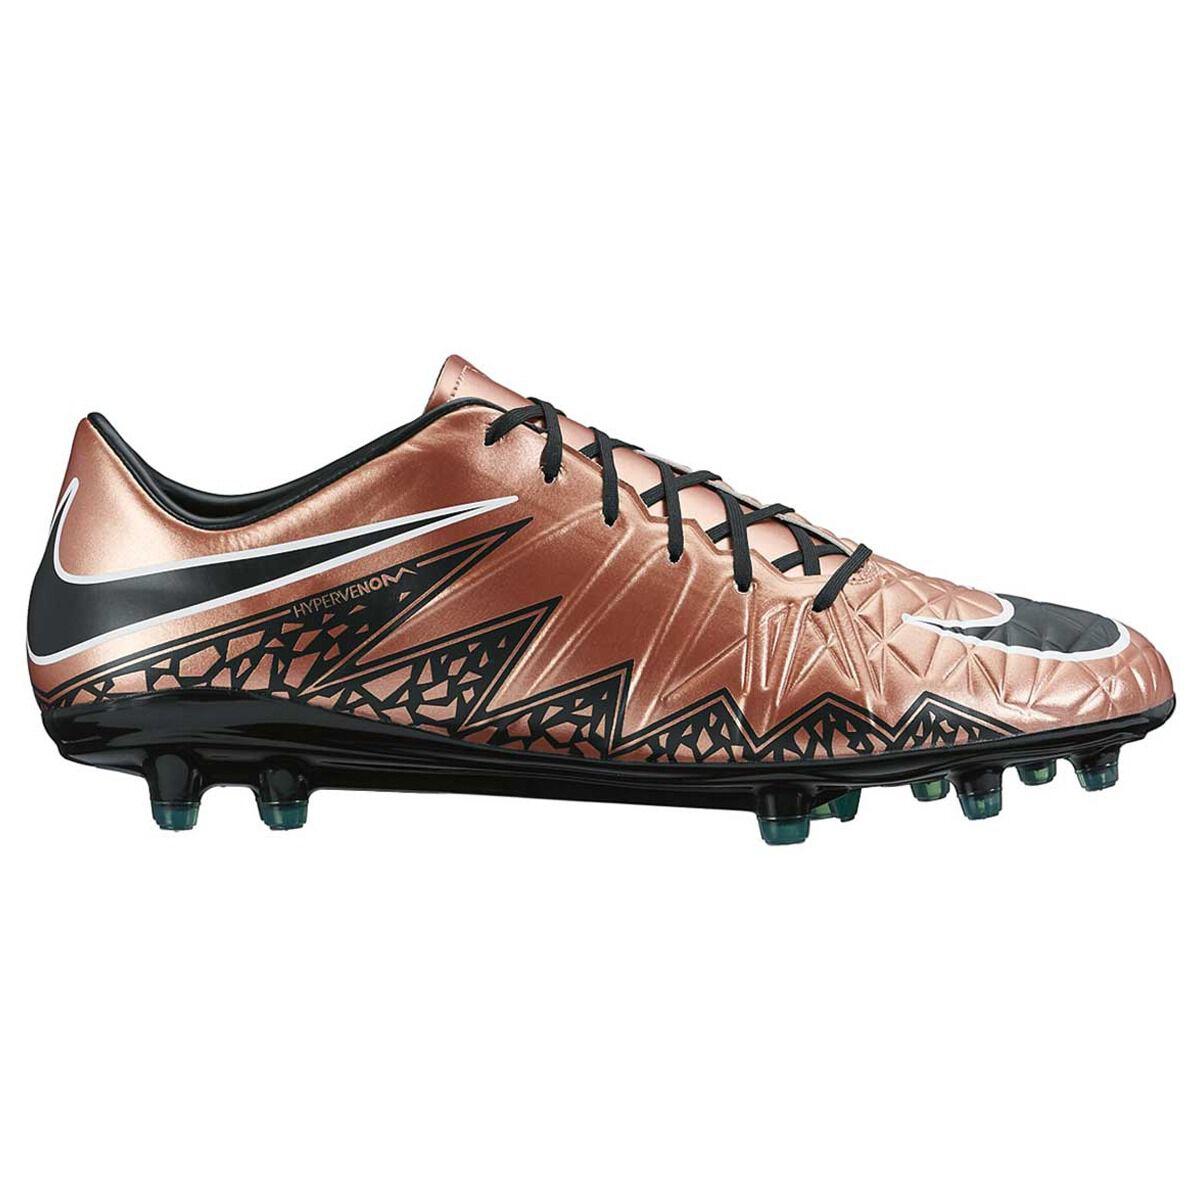 ... coupon code for nike hypervenom phatal ii mens football boots bronze us  9 adult bronze rebelhi 5caf14ebf